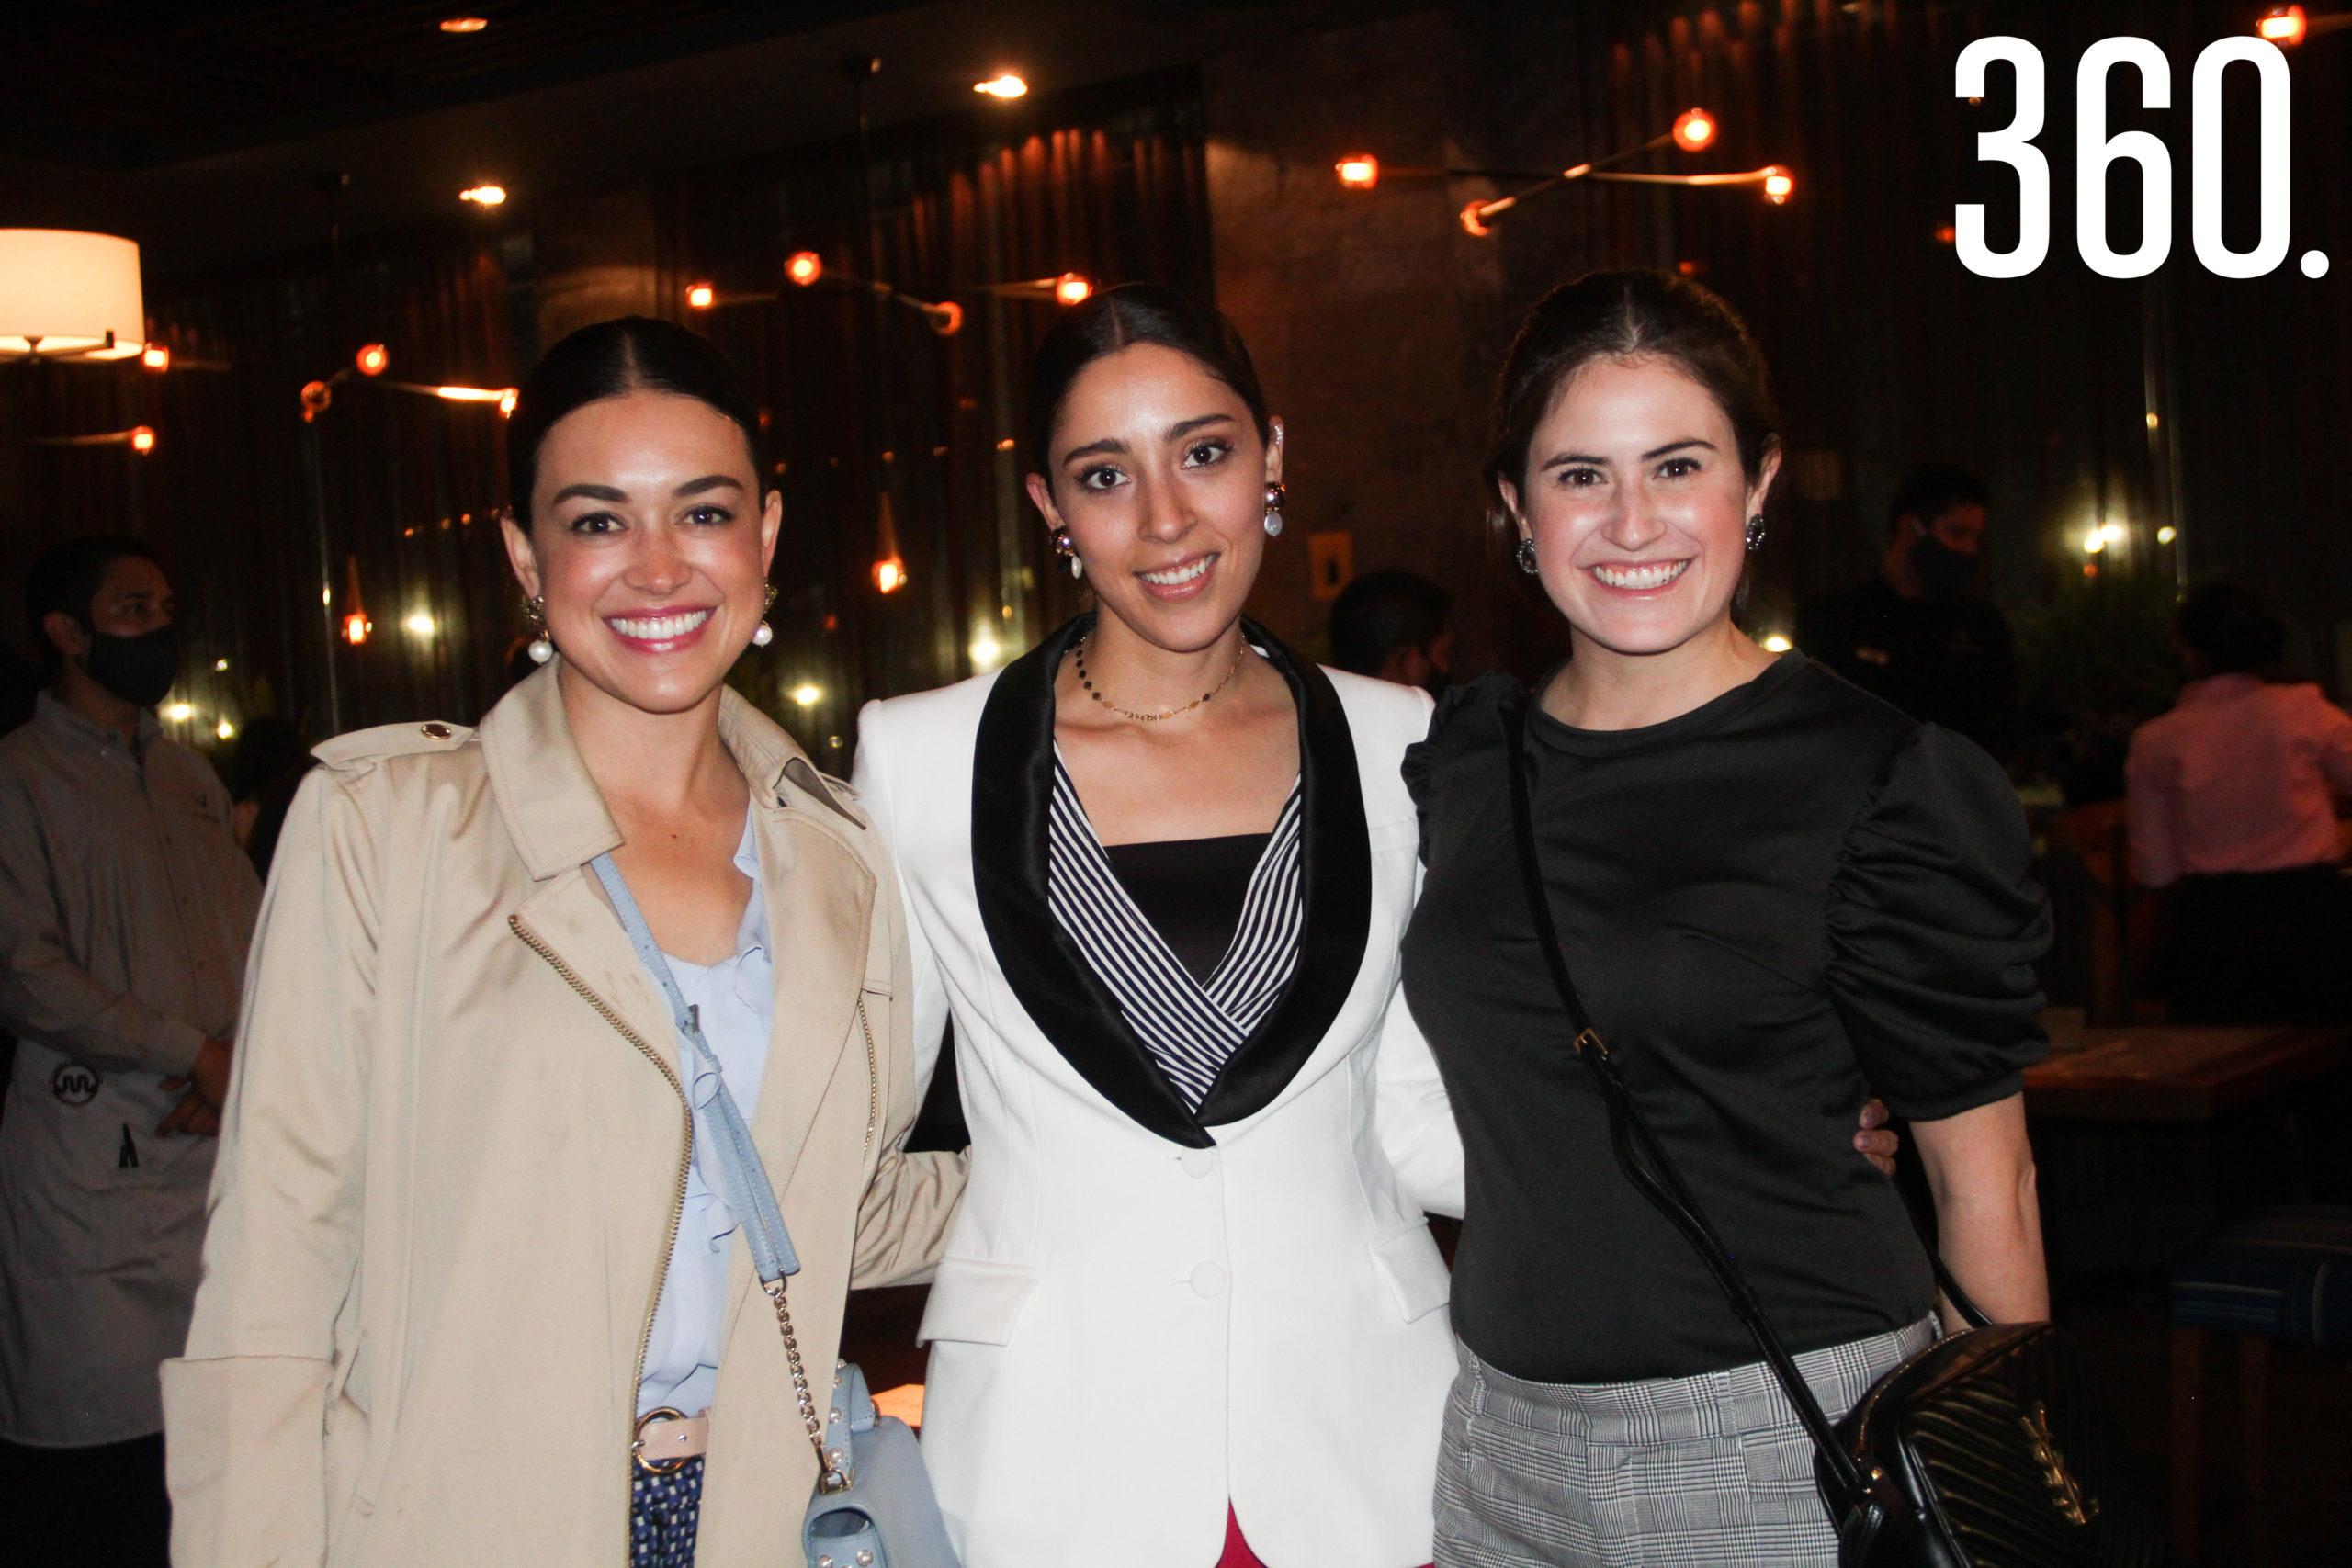 Tatiana Villarreal, Ana Cristina García y Paulina Fuentes, anfitrionas.